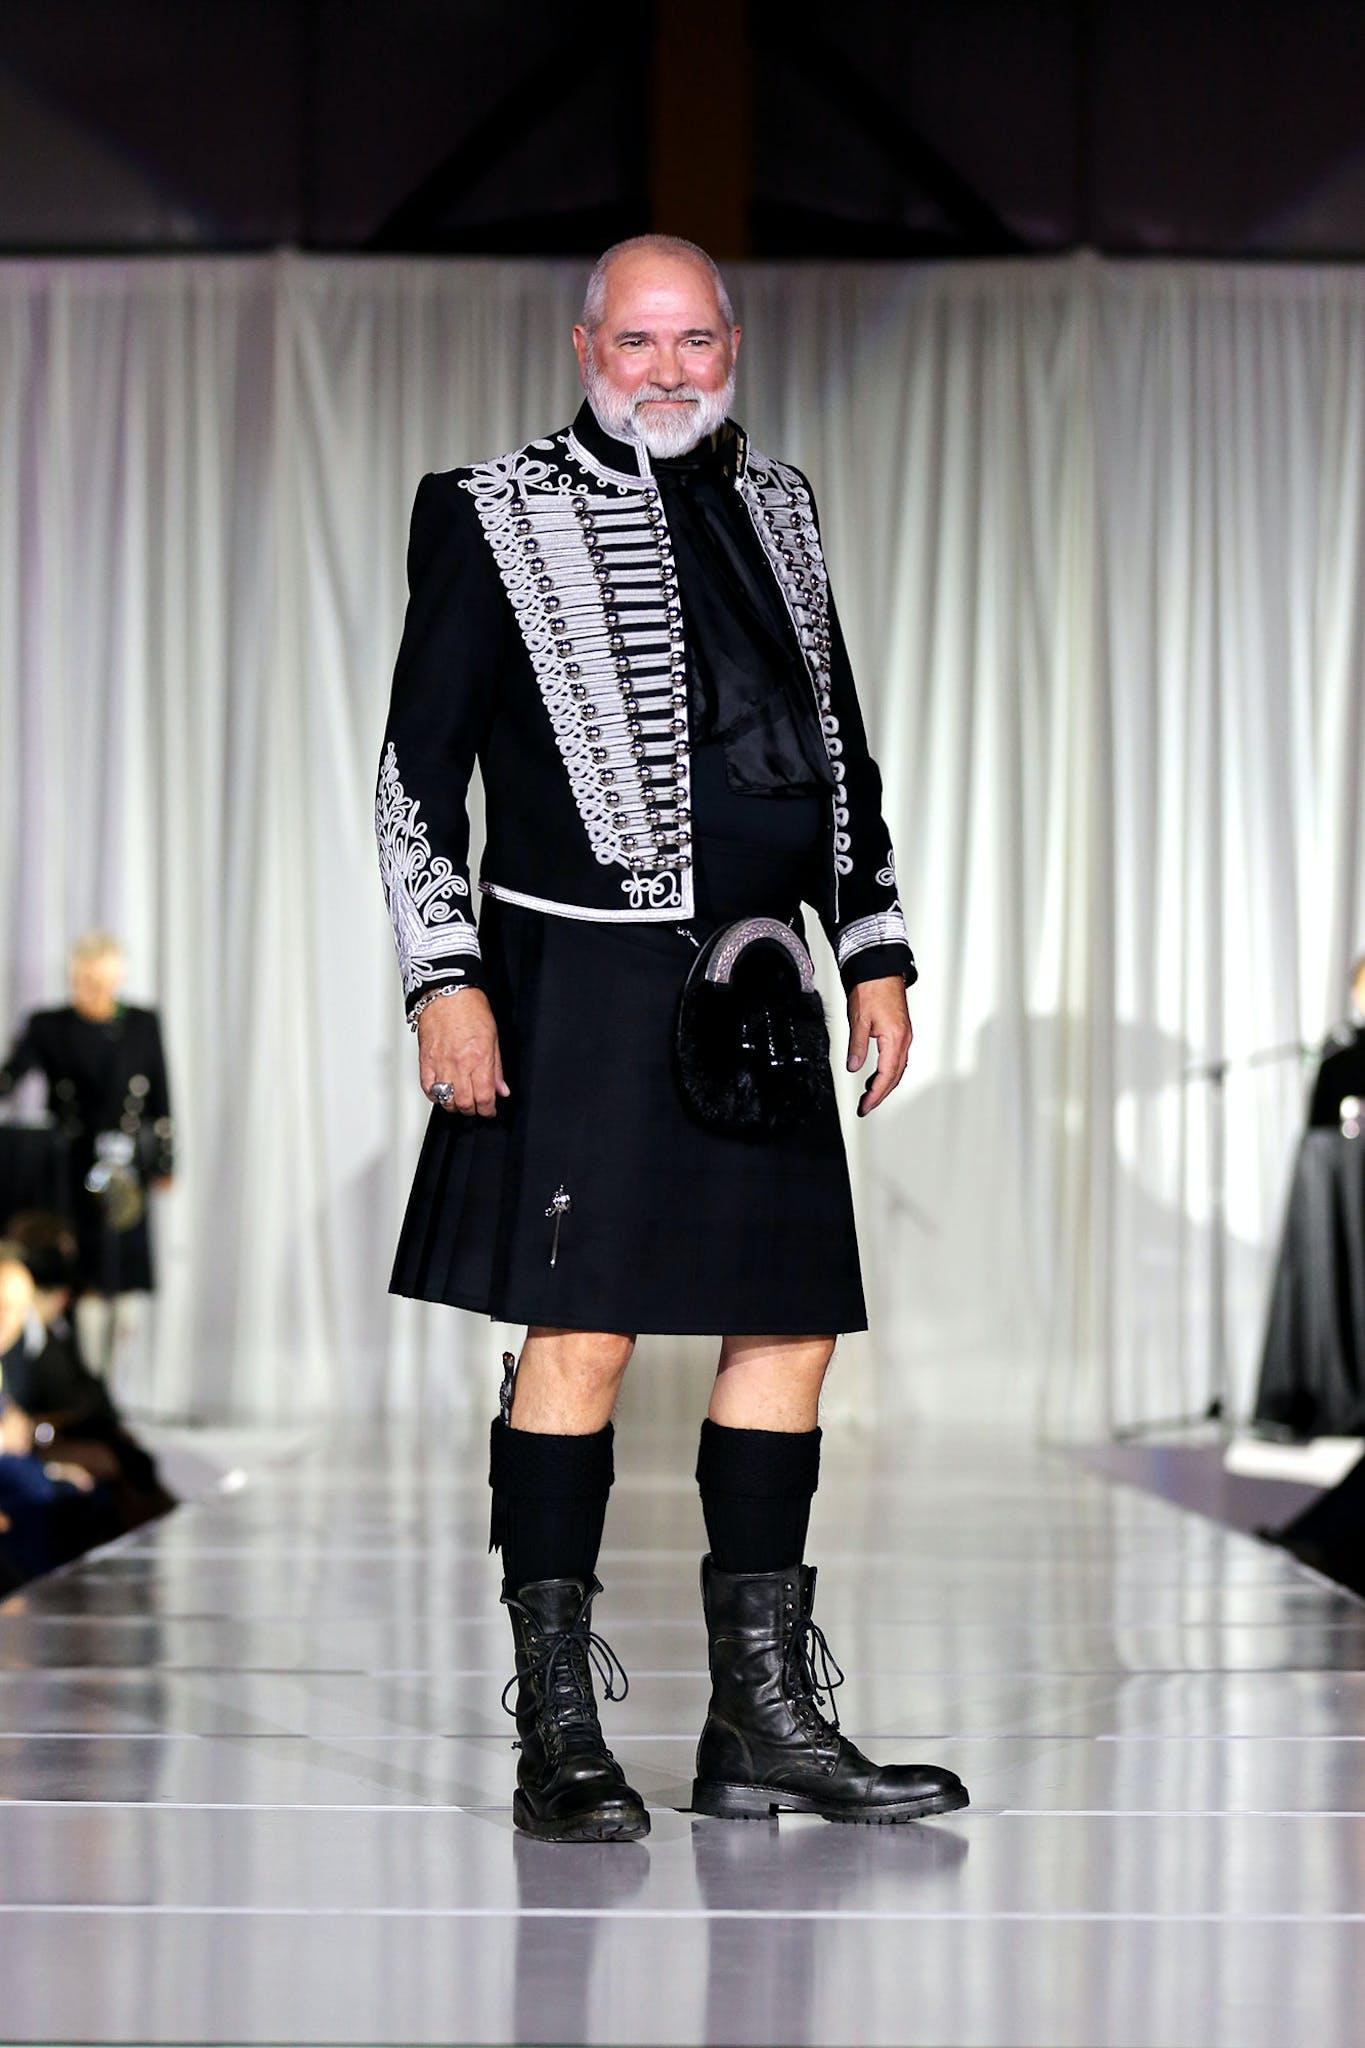 Dress to Kilt